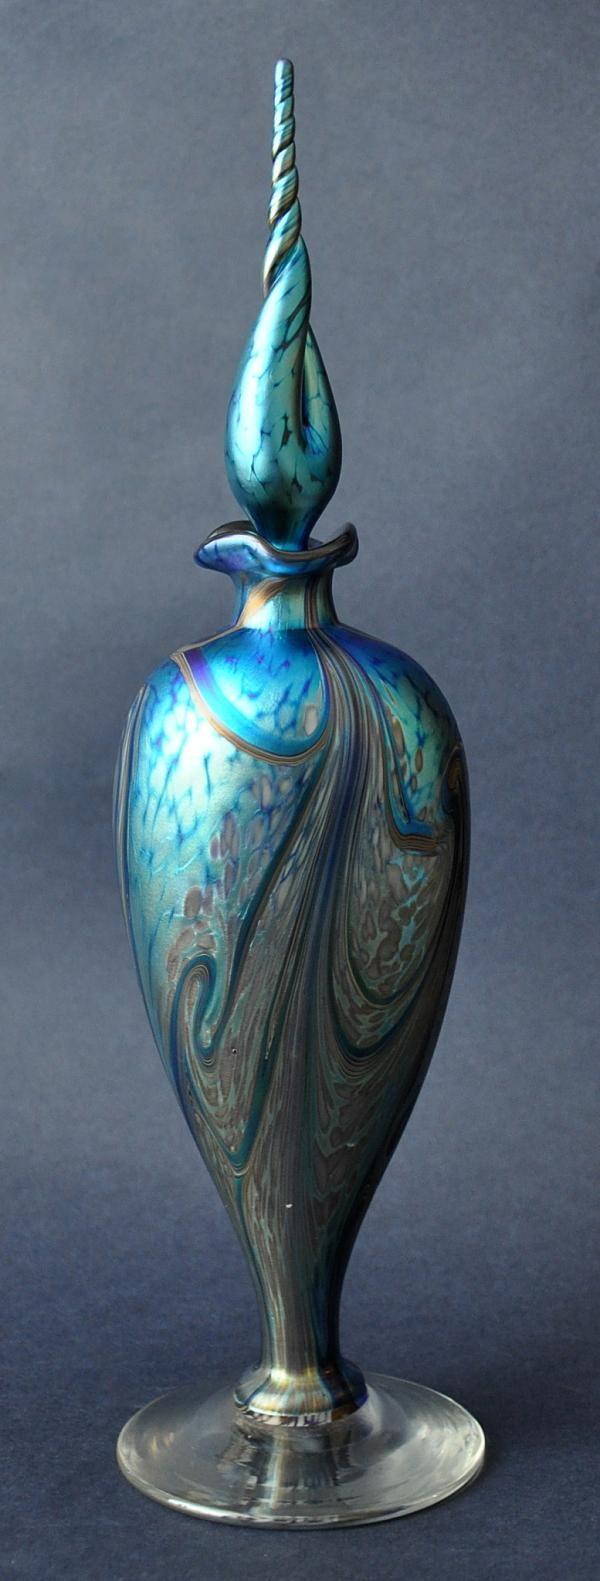 Richard Golding Glass Perfume Bottle